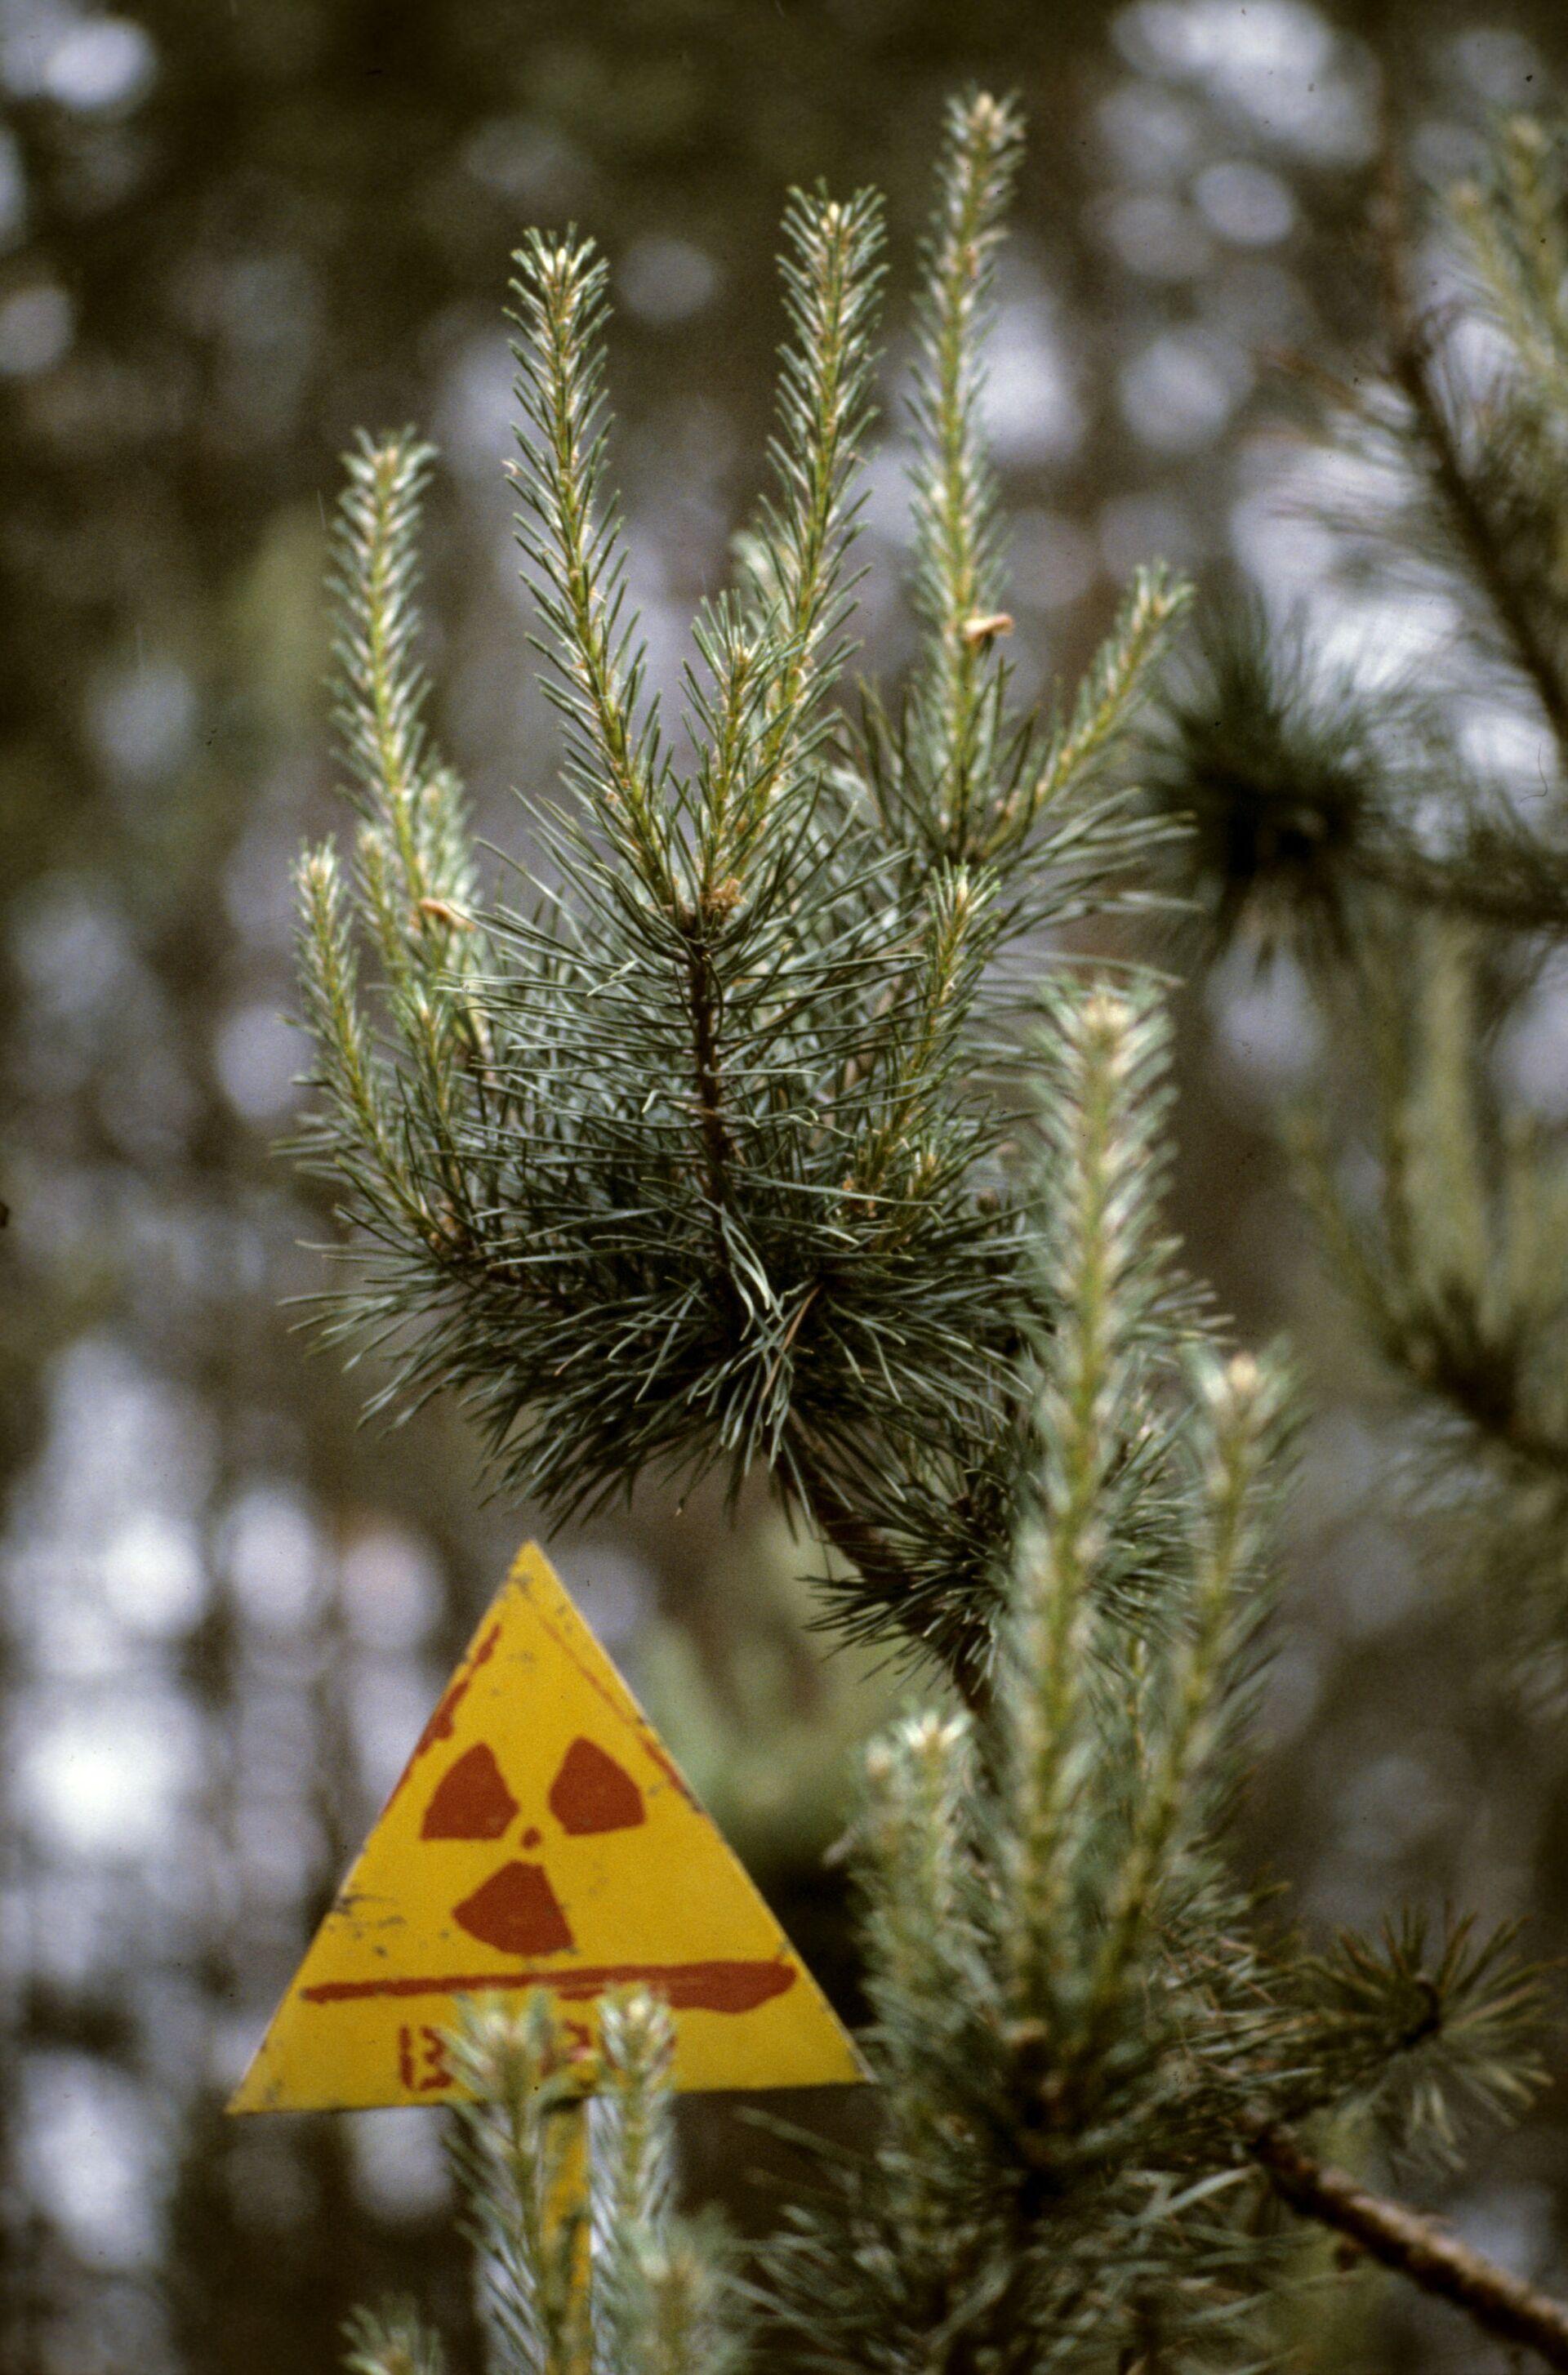 Bosco radioattivo nei pressi di Chernobyl - Sputnik Italia, 1920, 18.05.2021